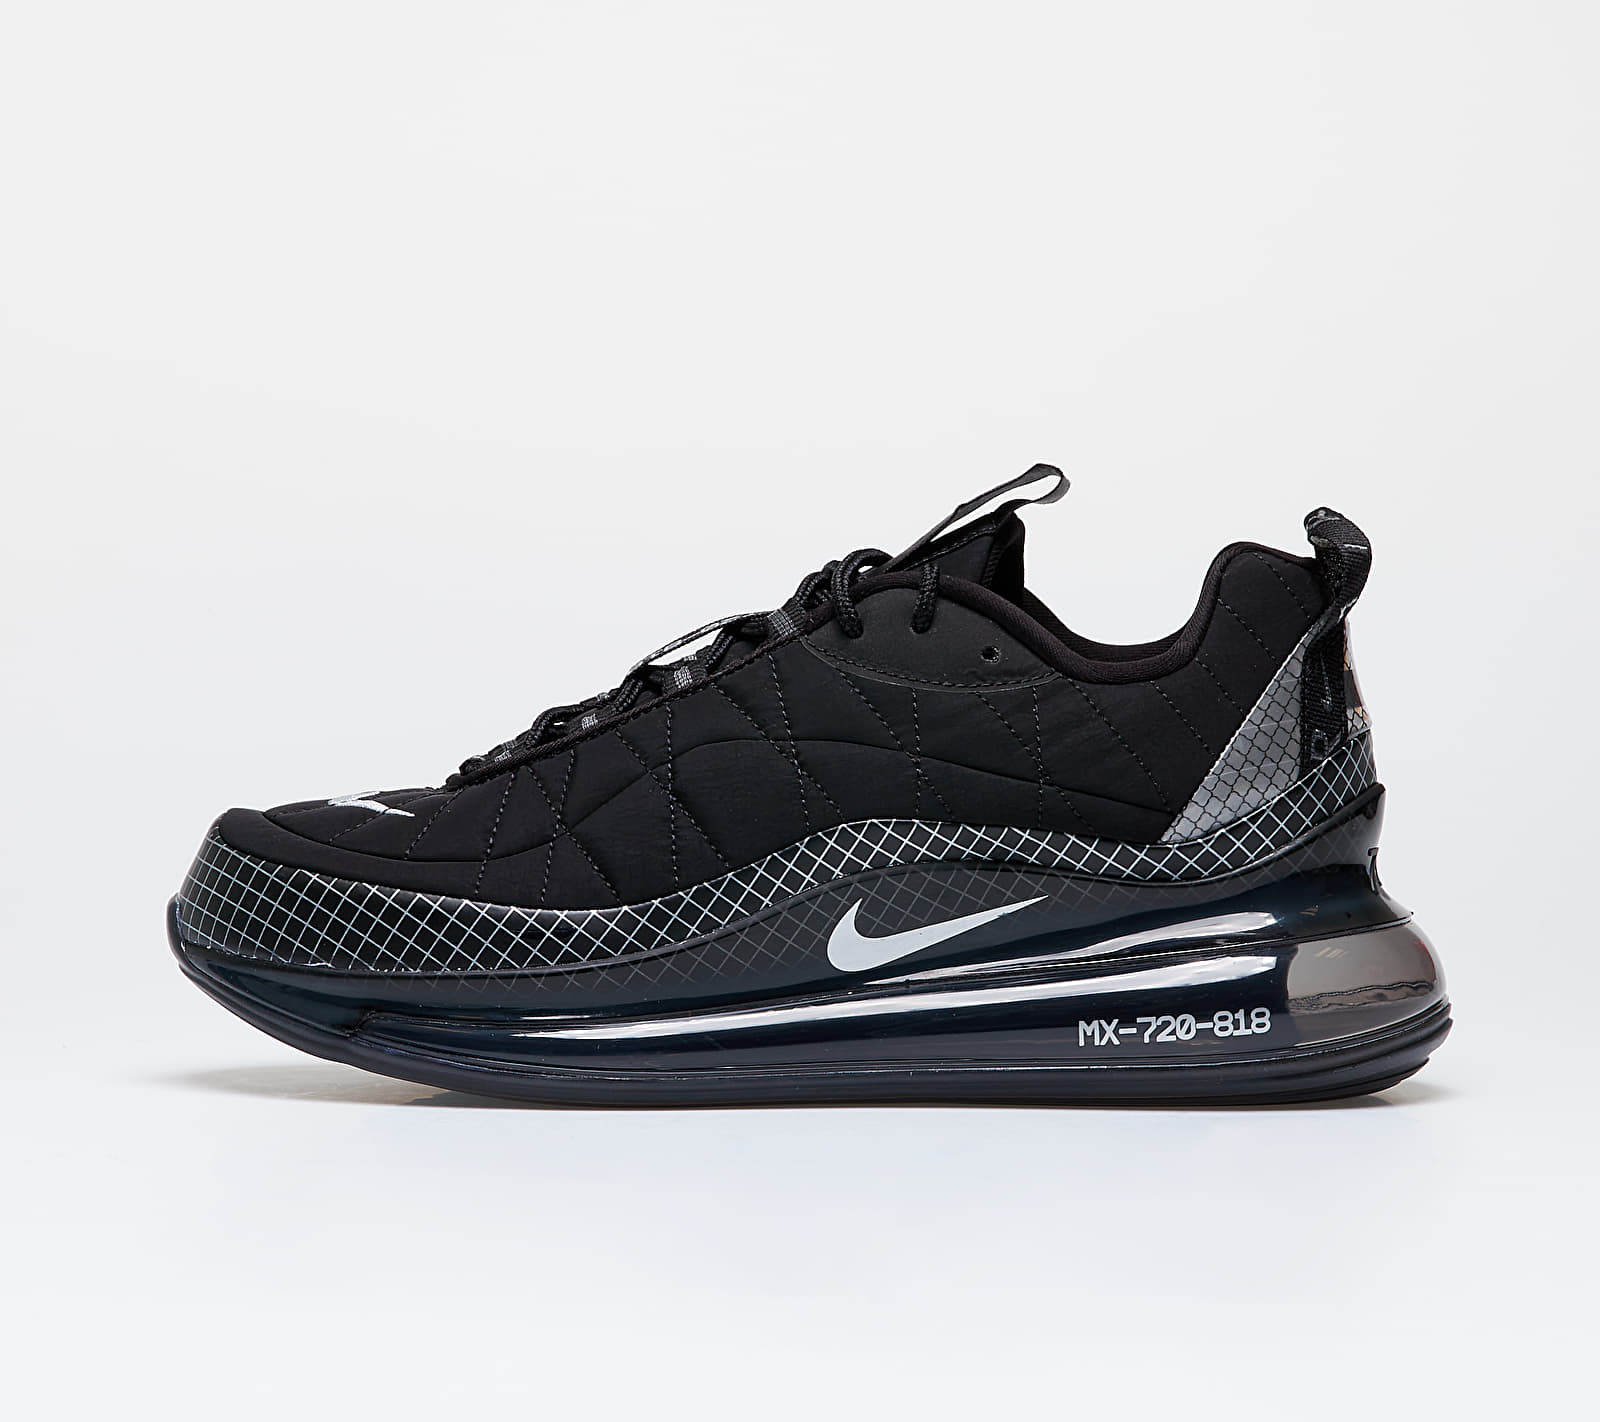 Nike Mx-720-818 Black/ Metallic Silver-Black-Anthracite CI3871-001